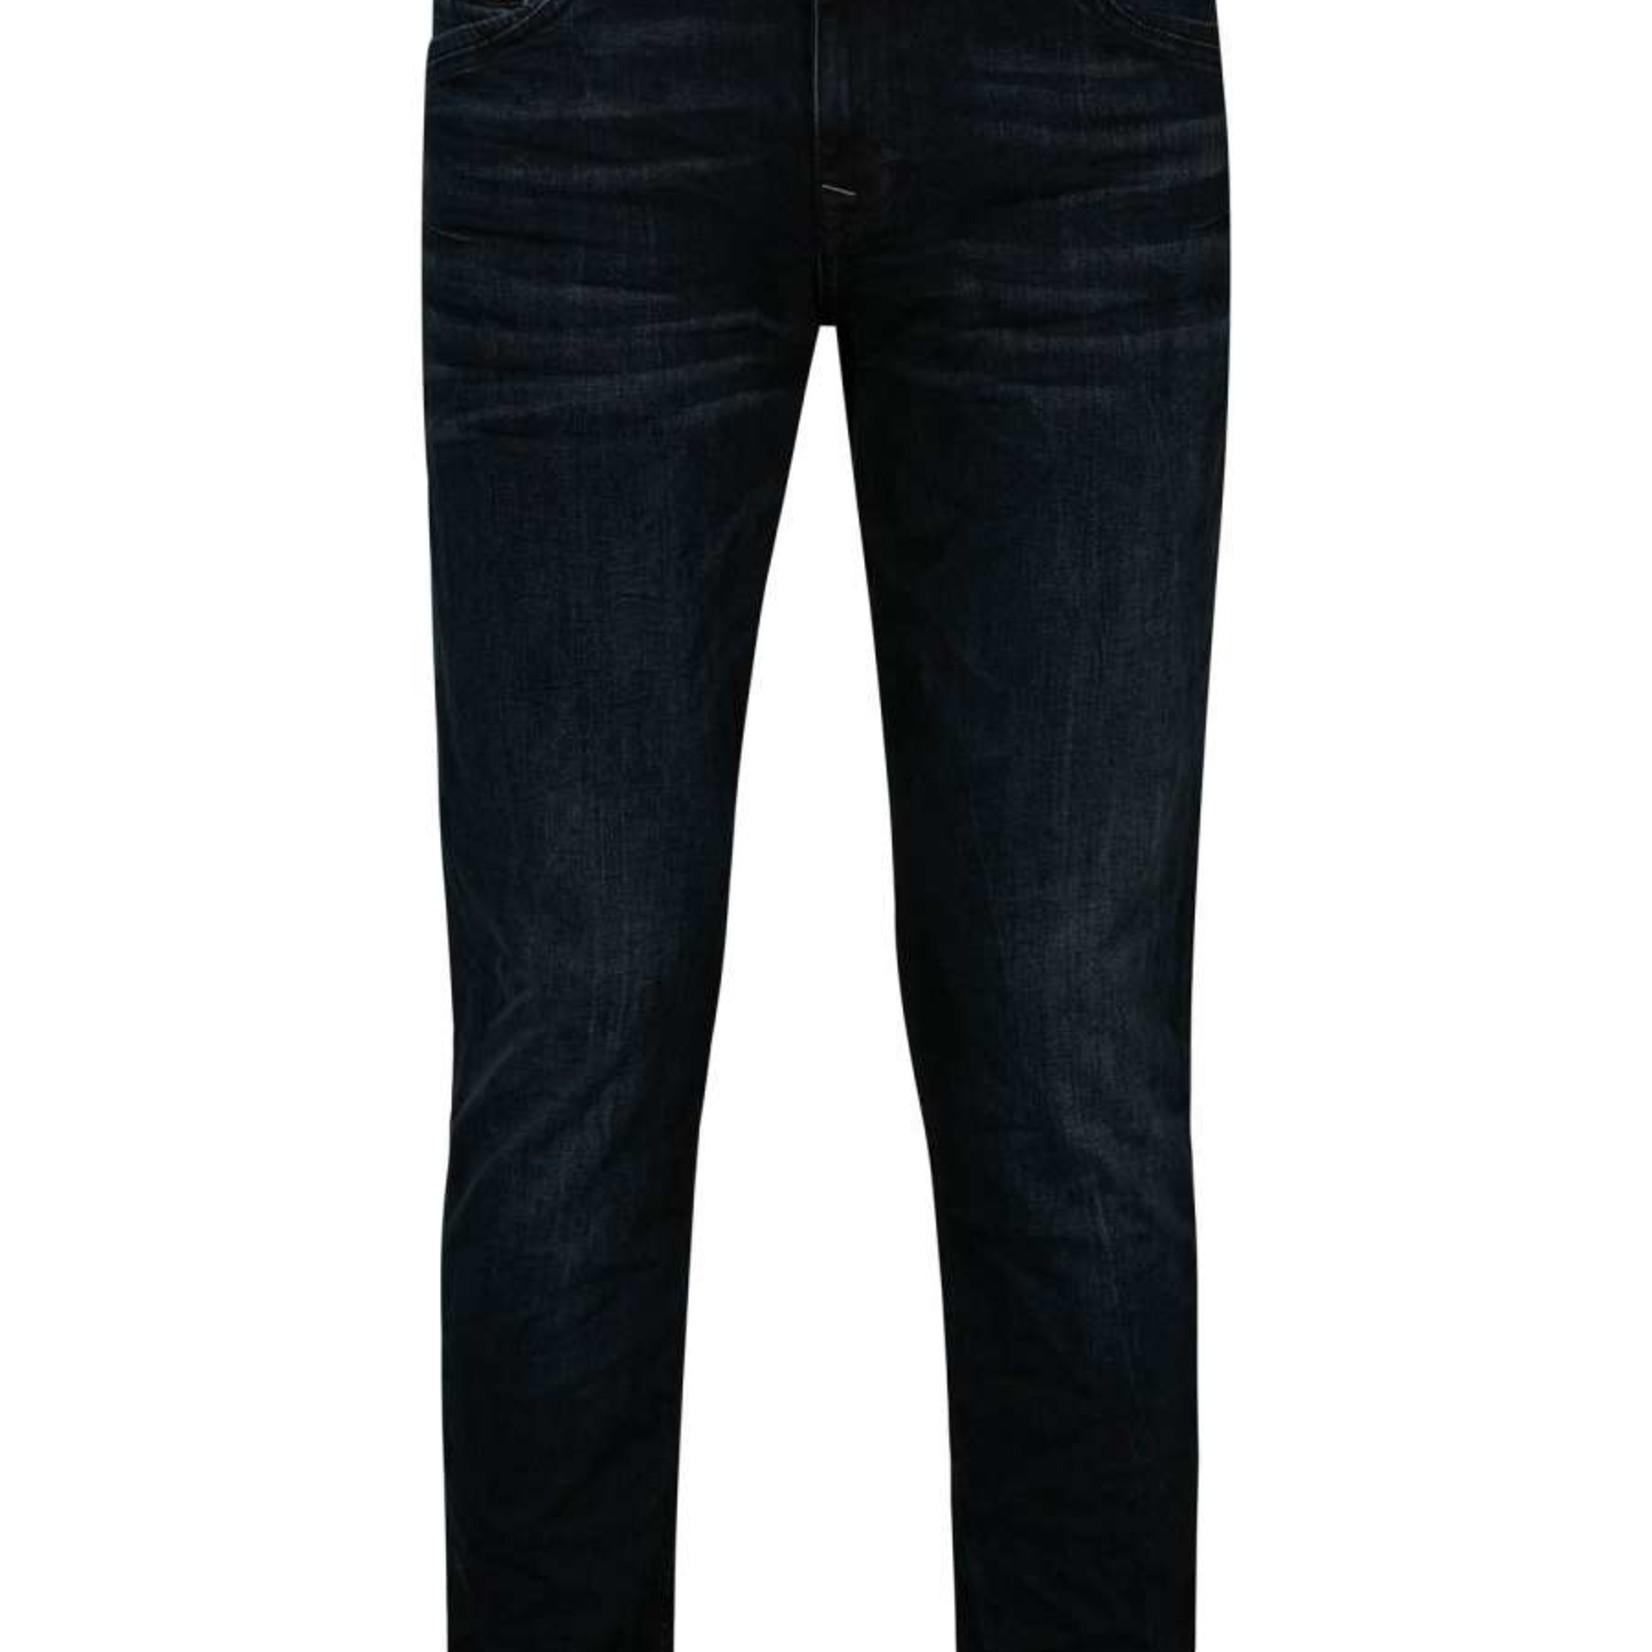 PETROL SEAHAM-TRACKER, heren jeans